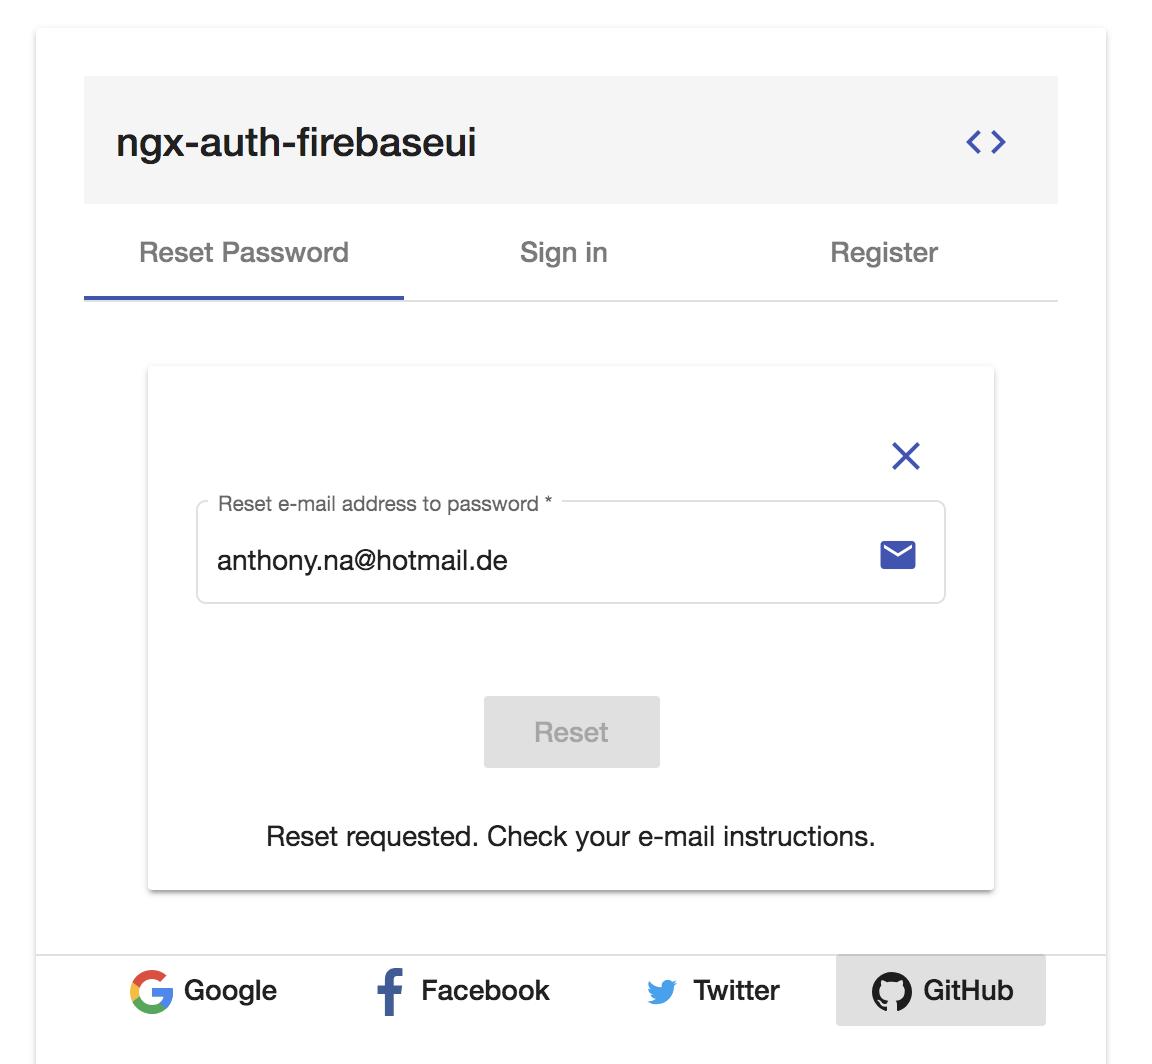 ngx-auth-firebaseui on mobile